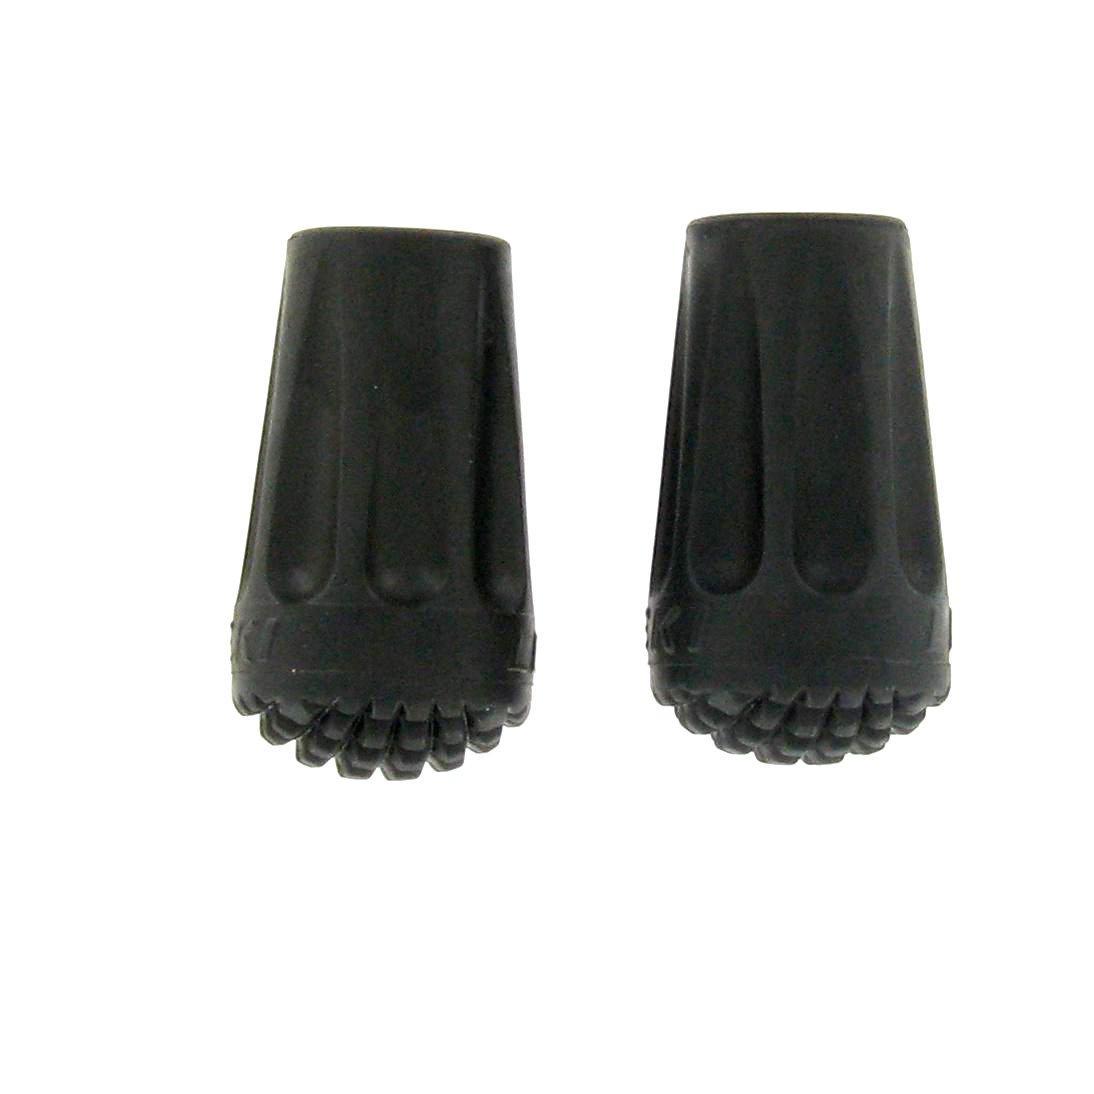 Leki Leki 2 Pack Rubber Walking Pole Tips - Black, Black